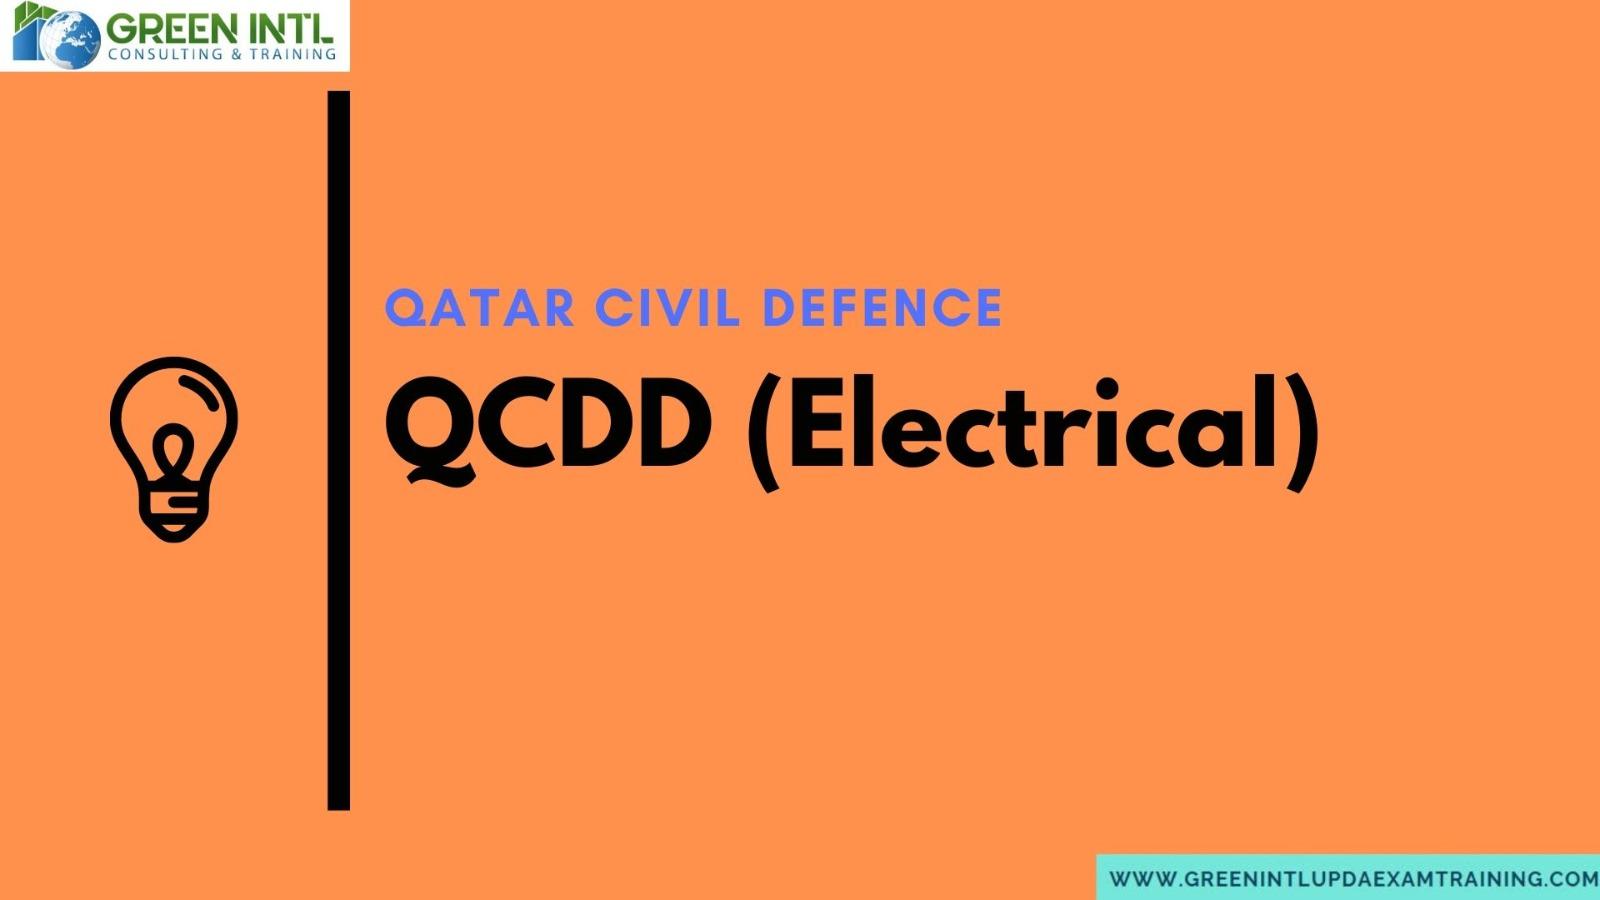 qcdd exam best training center